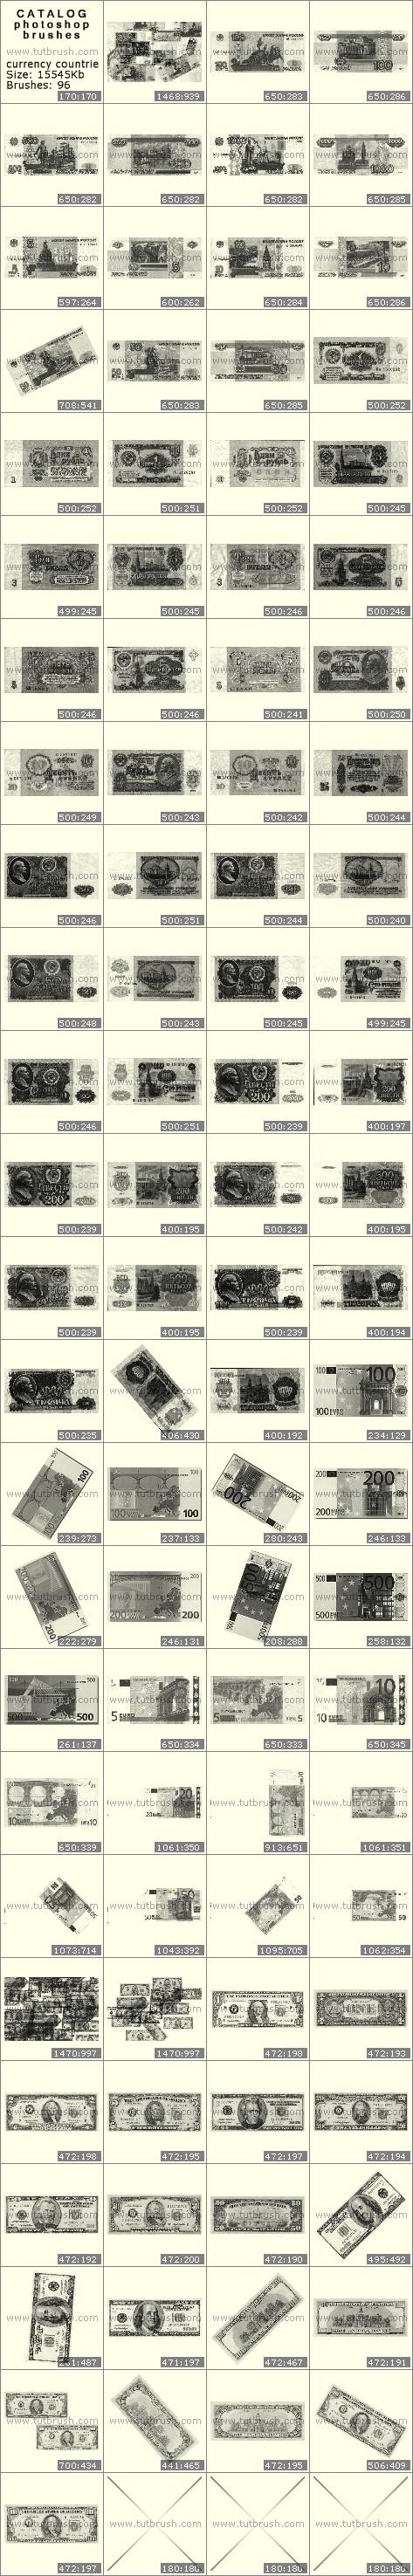 Кисти фотошоп Валюта стран